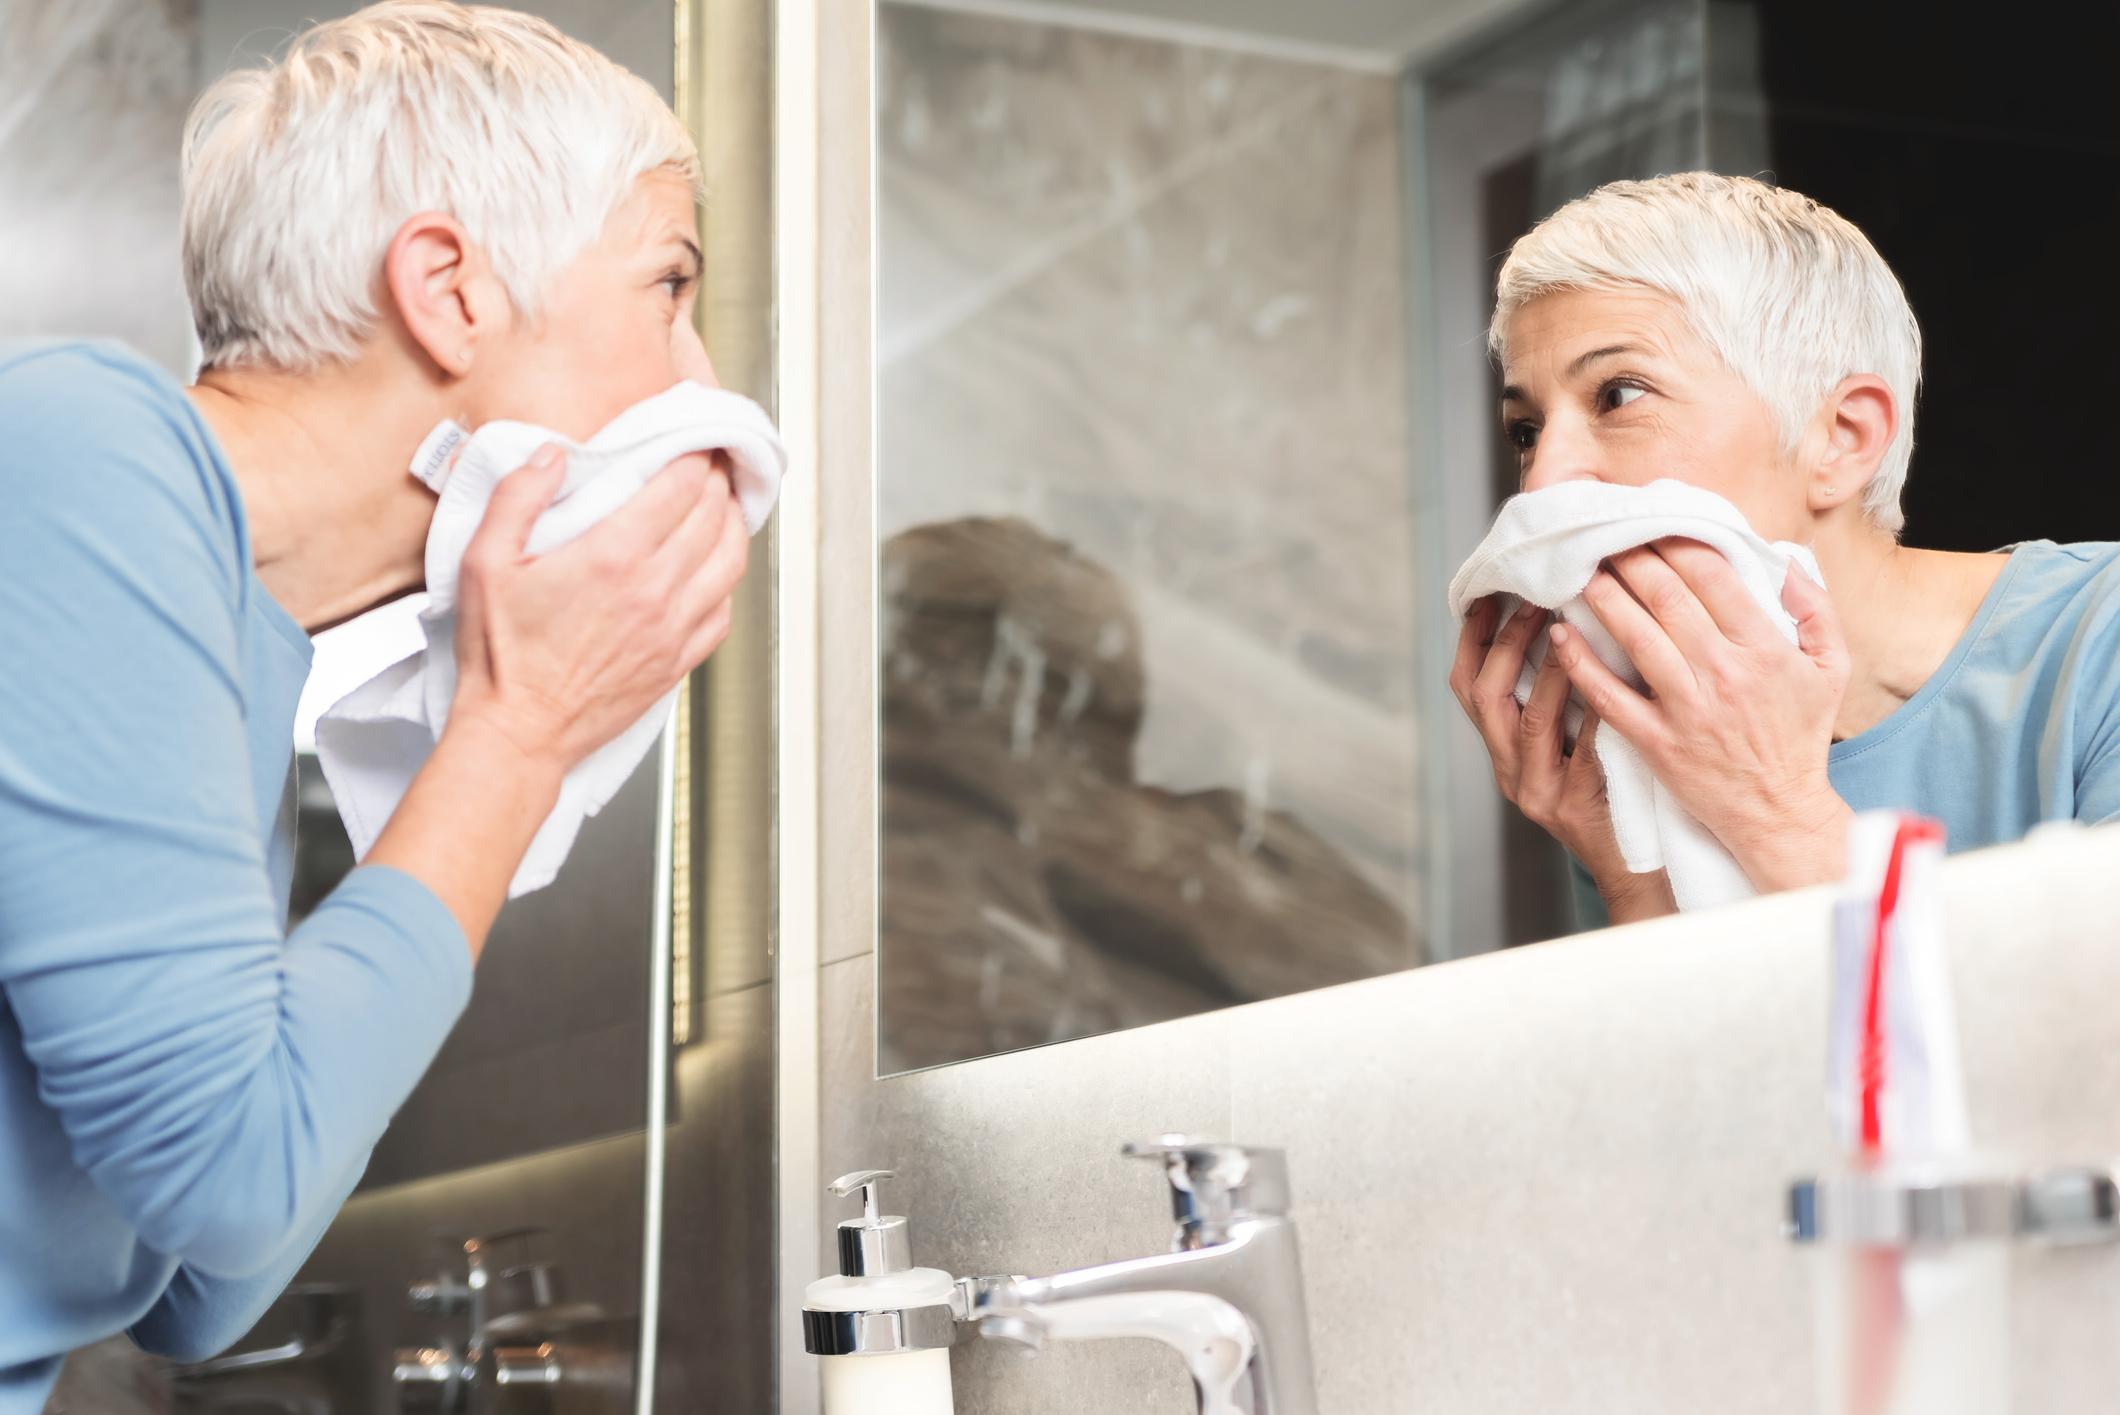 Mujer rubia de pelo corto lavándose la cara